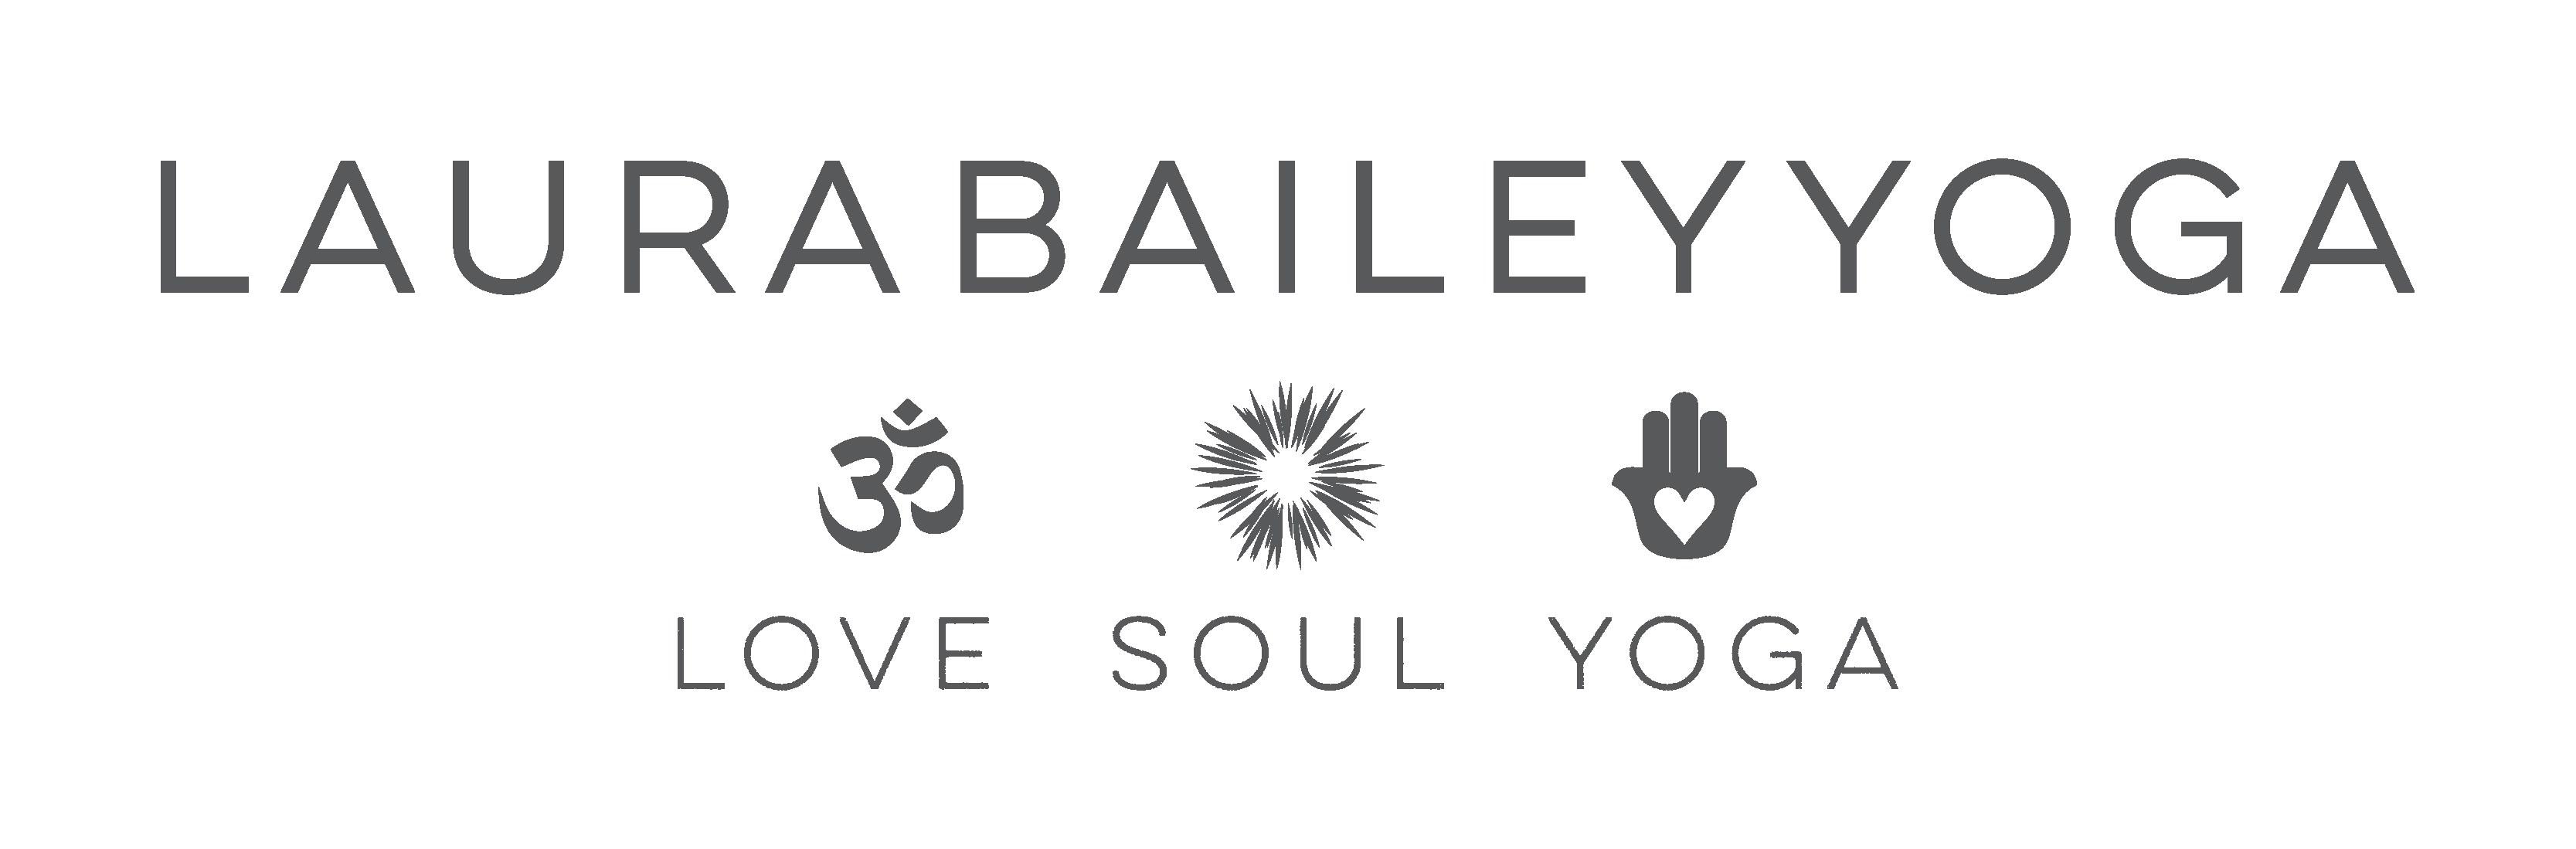 Laura Bailey Yoga